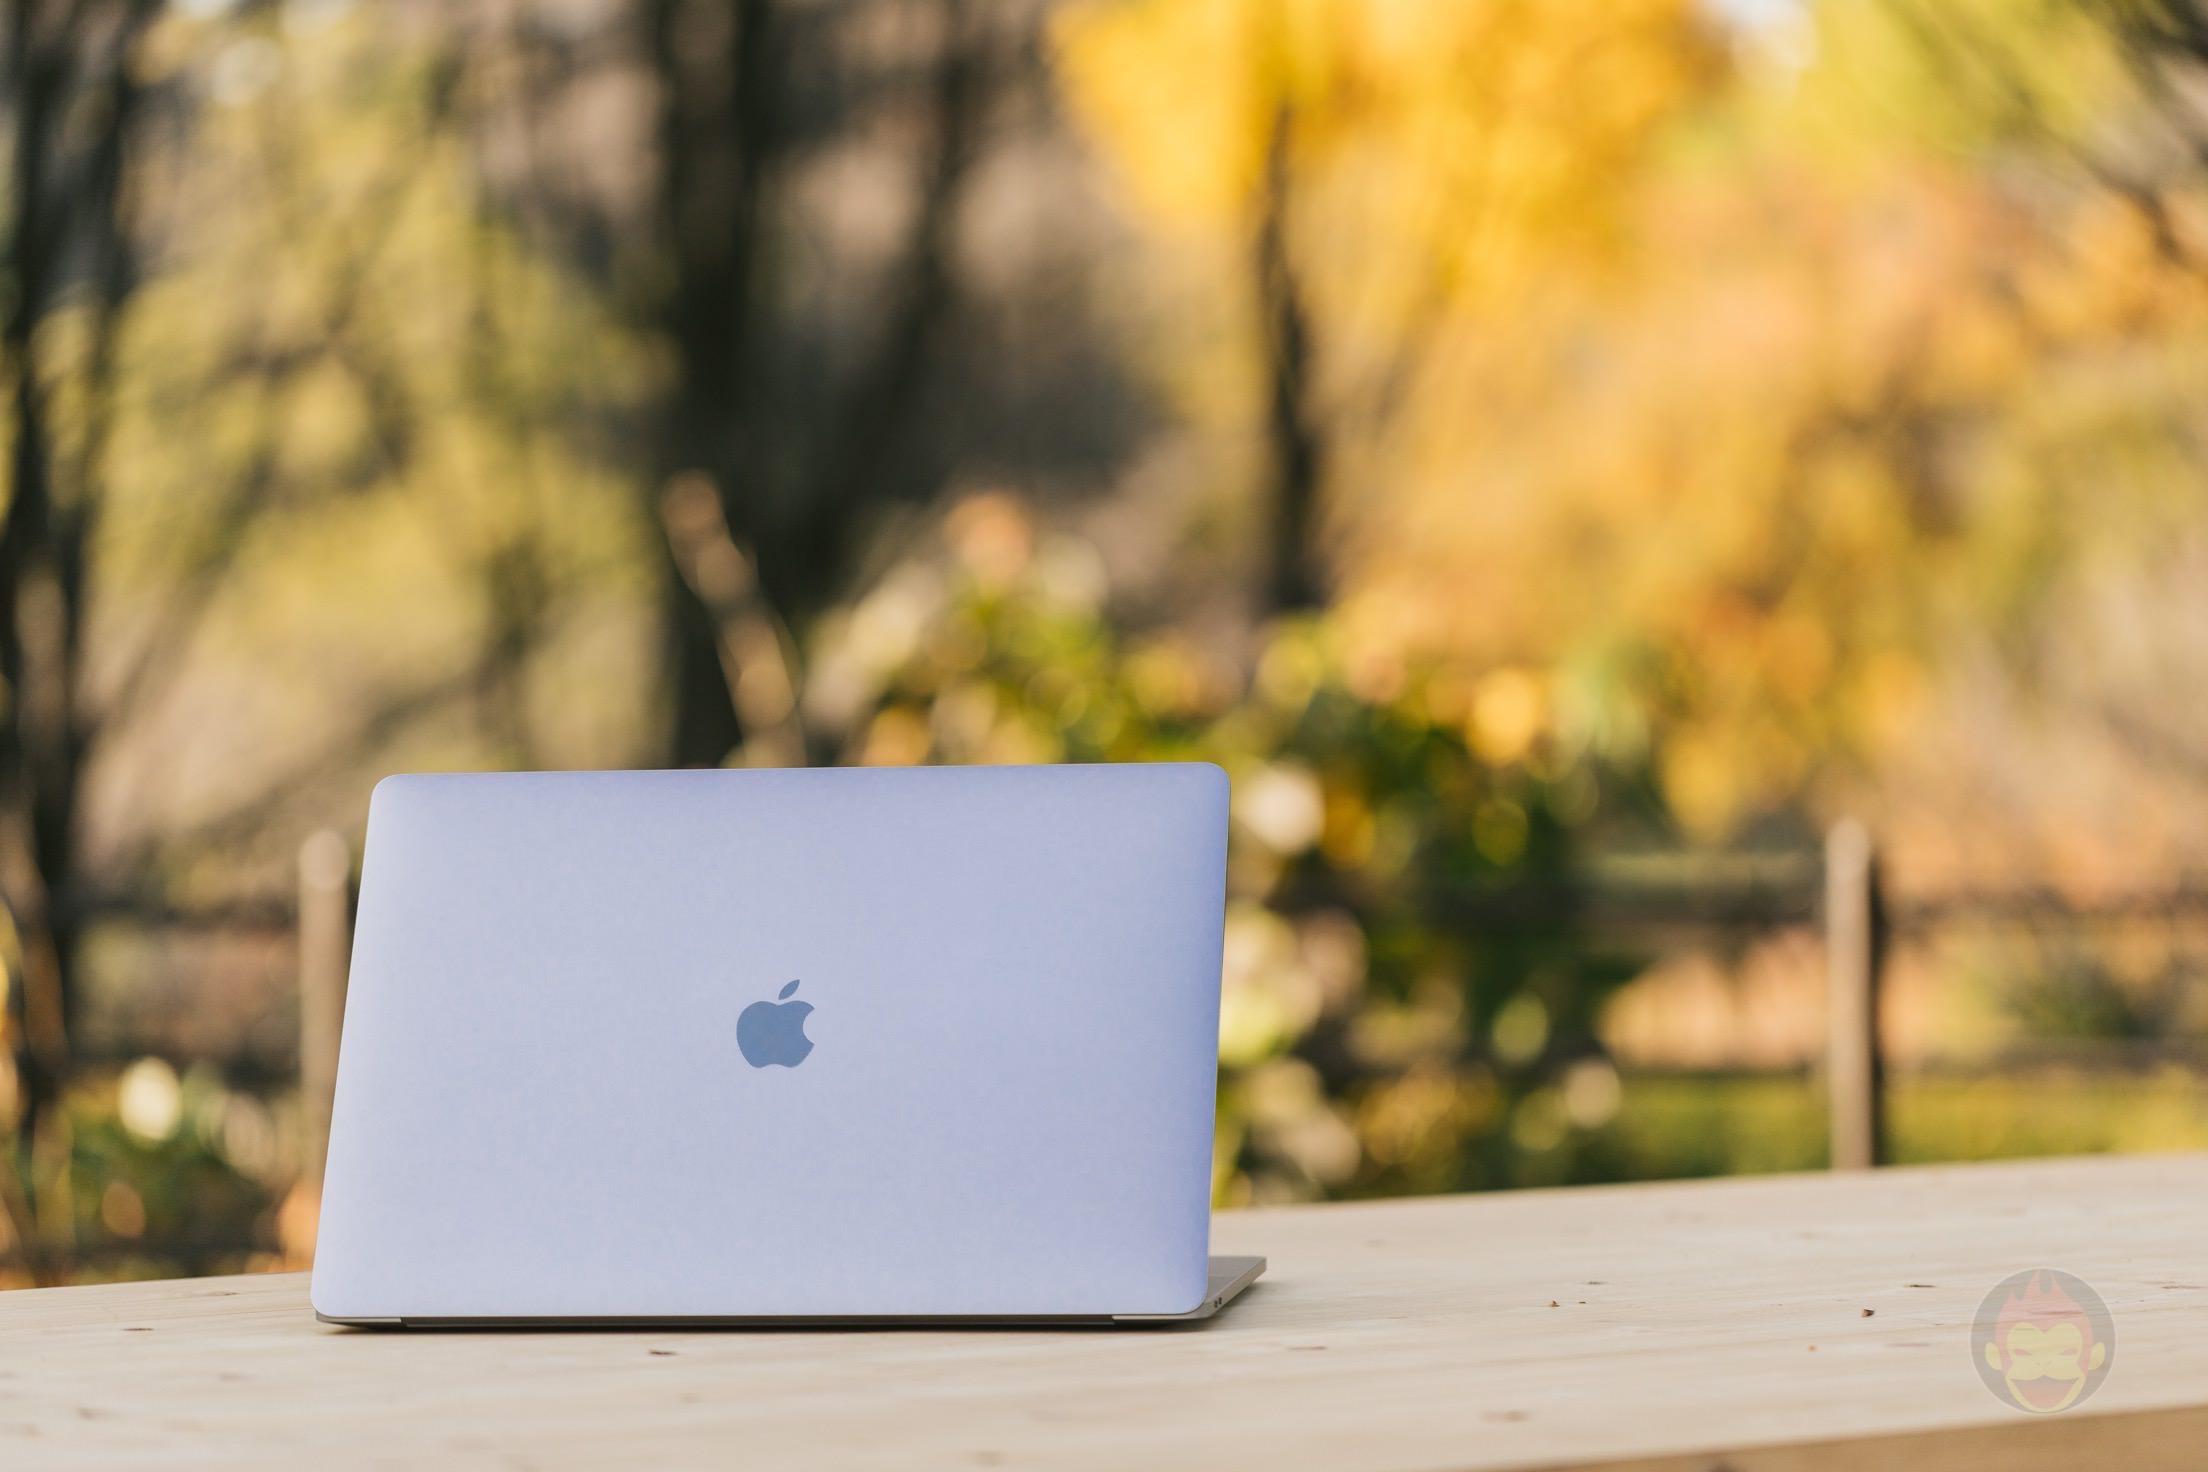 MacBook-Pro-Late2016-15inch-model-photos-16.jpg